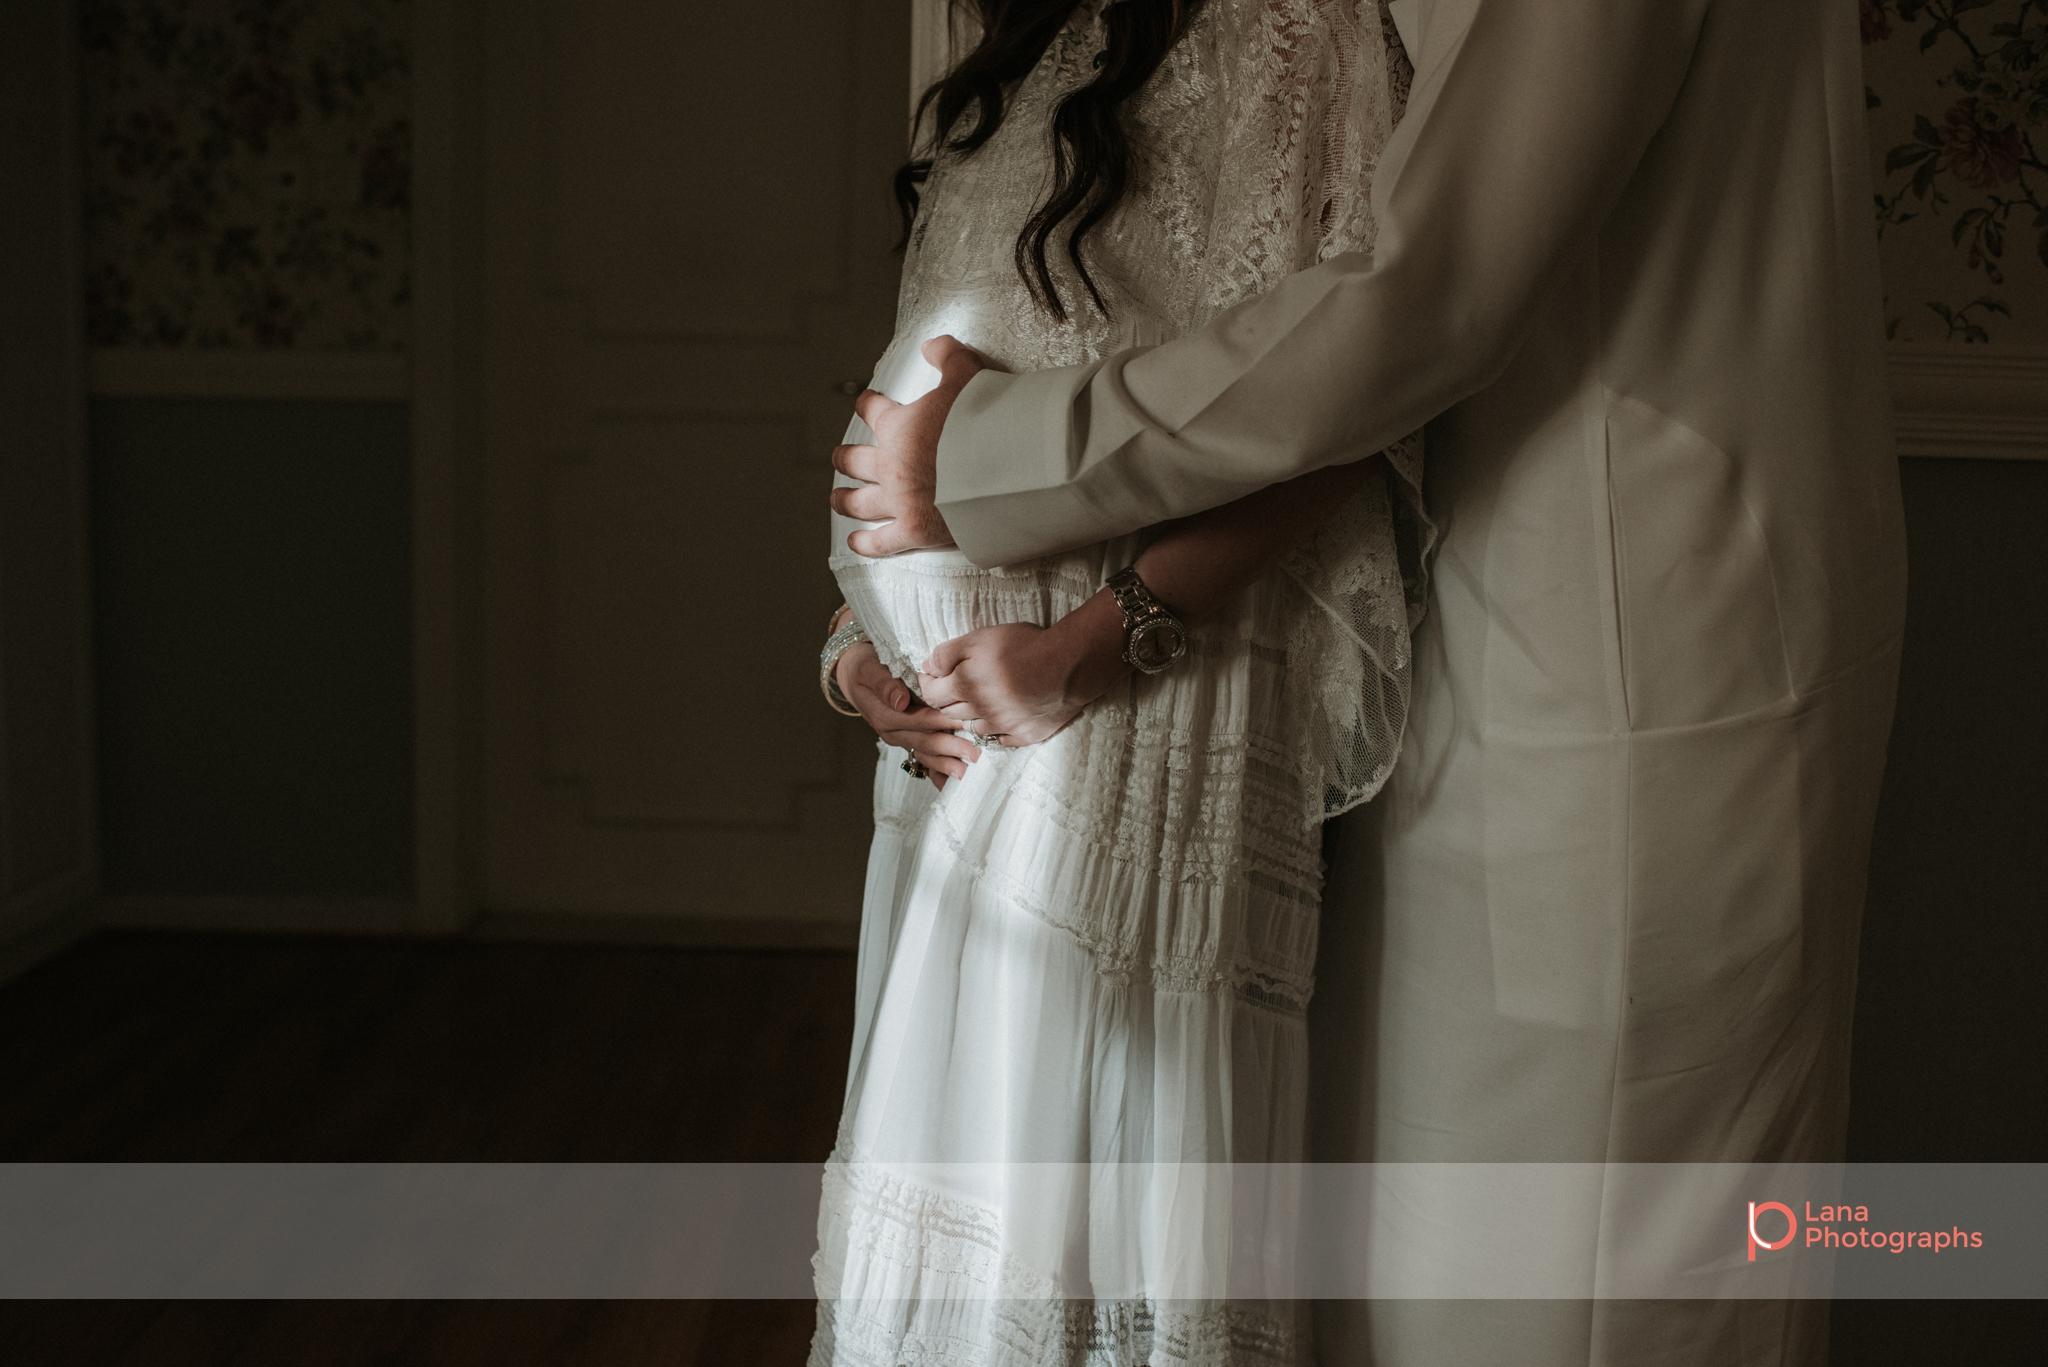 Lana Photographs Family Photographer Dubai Top Family Photographers portrait of expecting couple